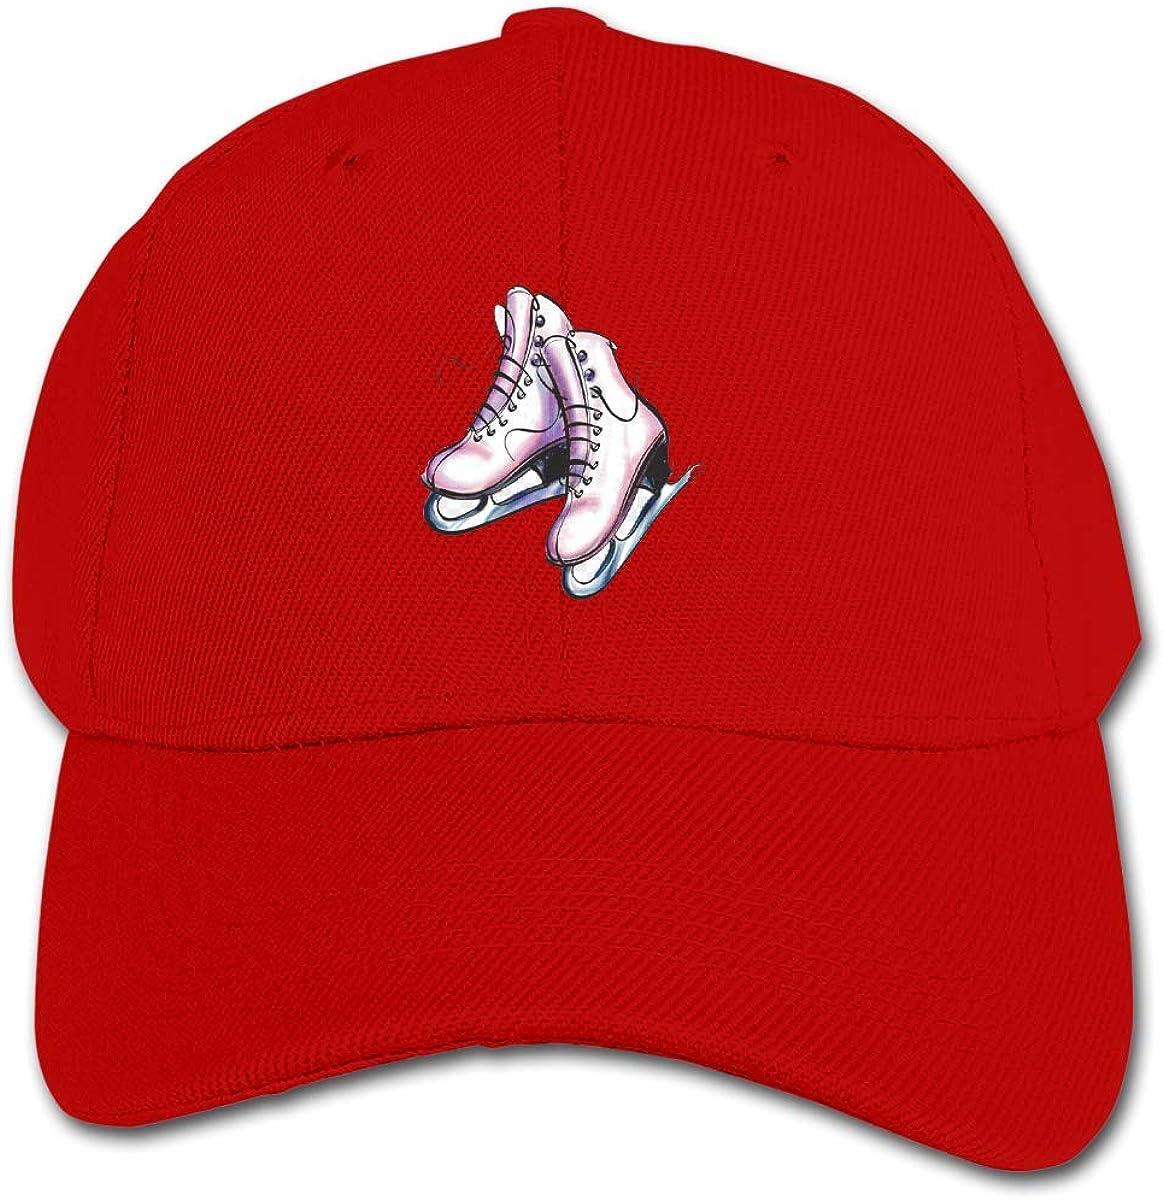 Cartoon Ice Skating Skates Kids Baseball Cap Hat Unisex Toddler Sun Hat Adsjutable Trucker Hat